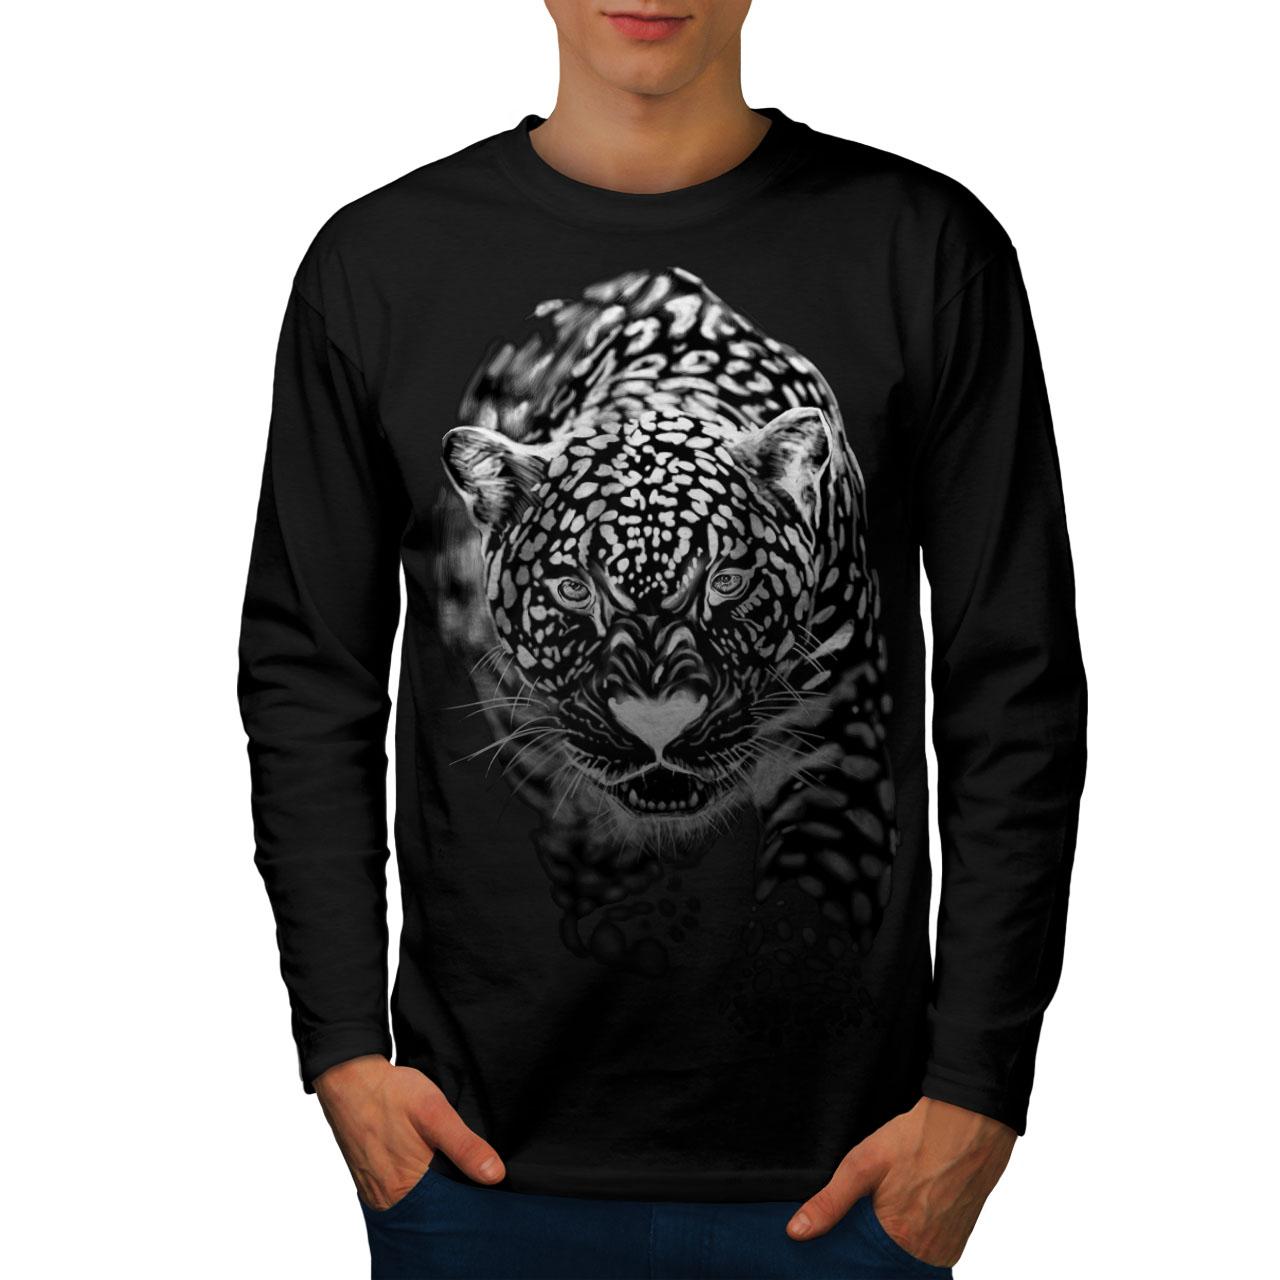 Cat Graphic Design Wellcoda Cougar Killer Mens Long Sleeve T-shirt